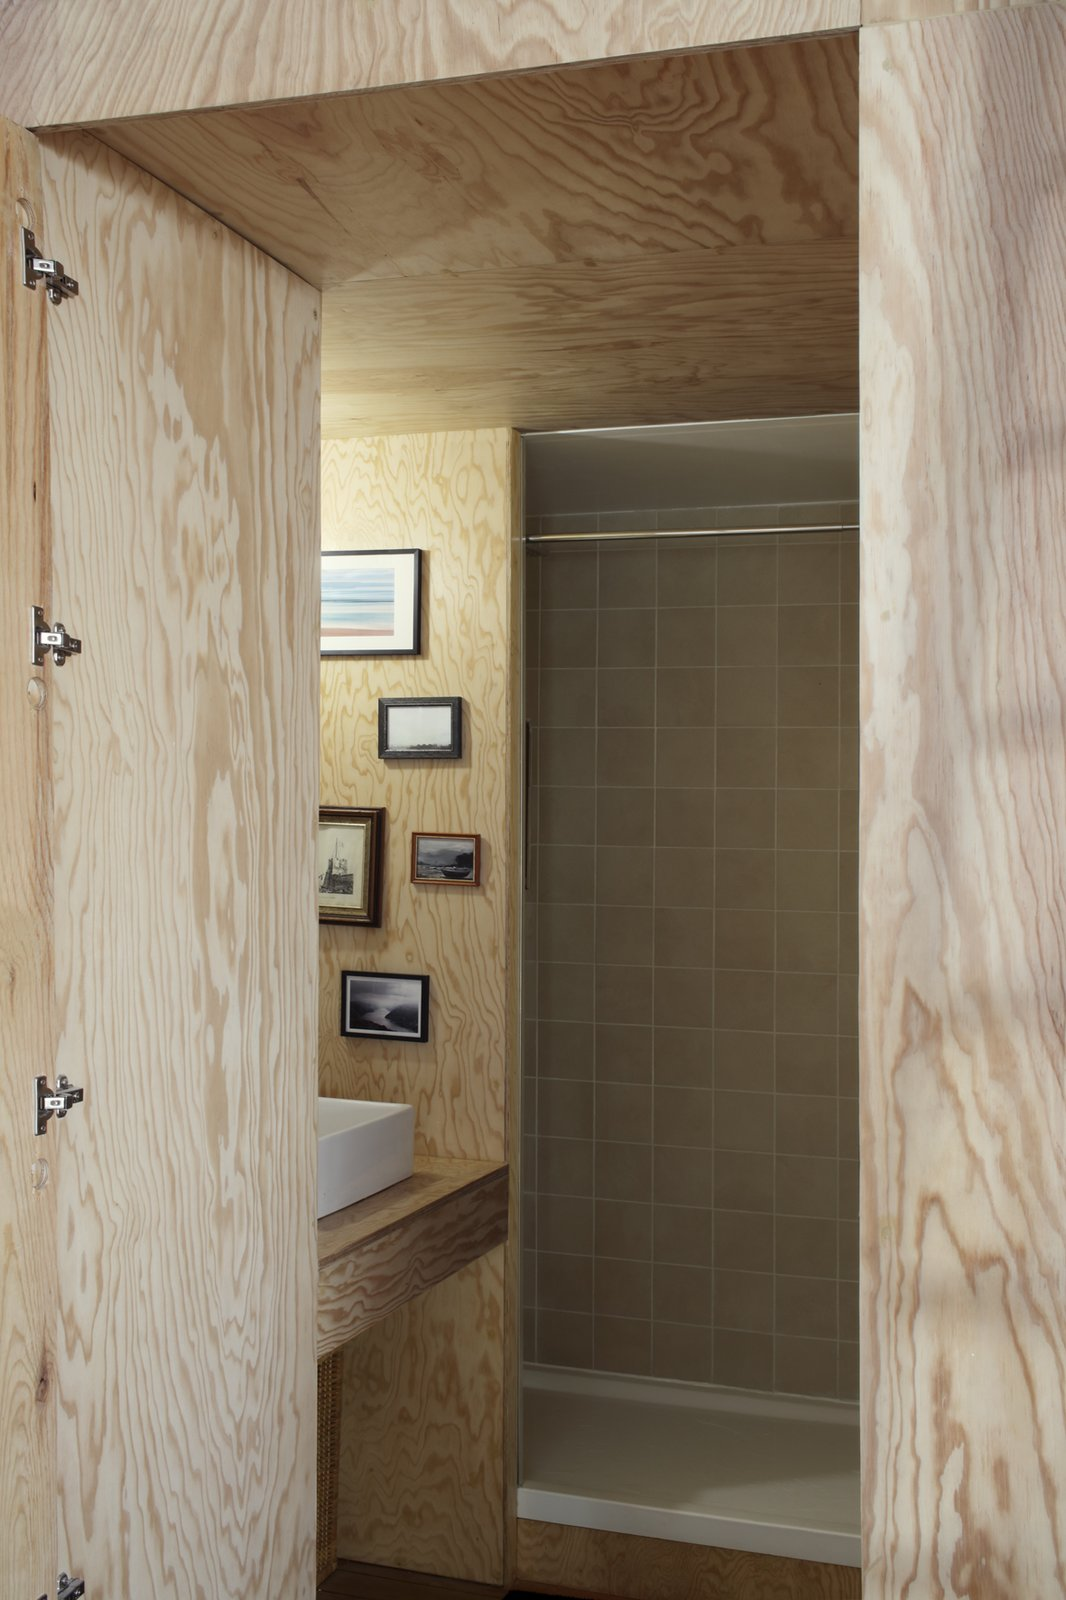 Pine Flat bathroom